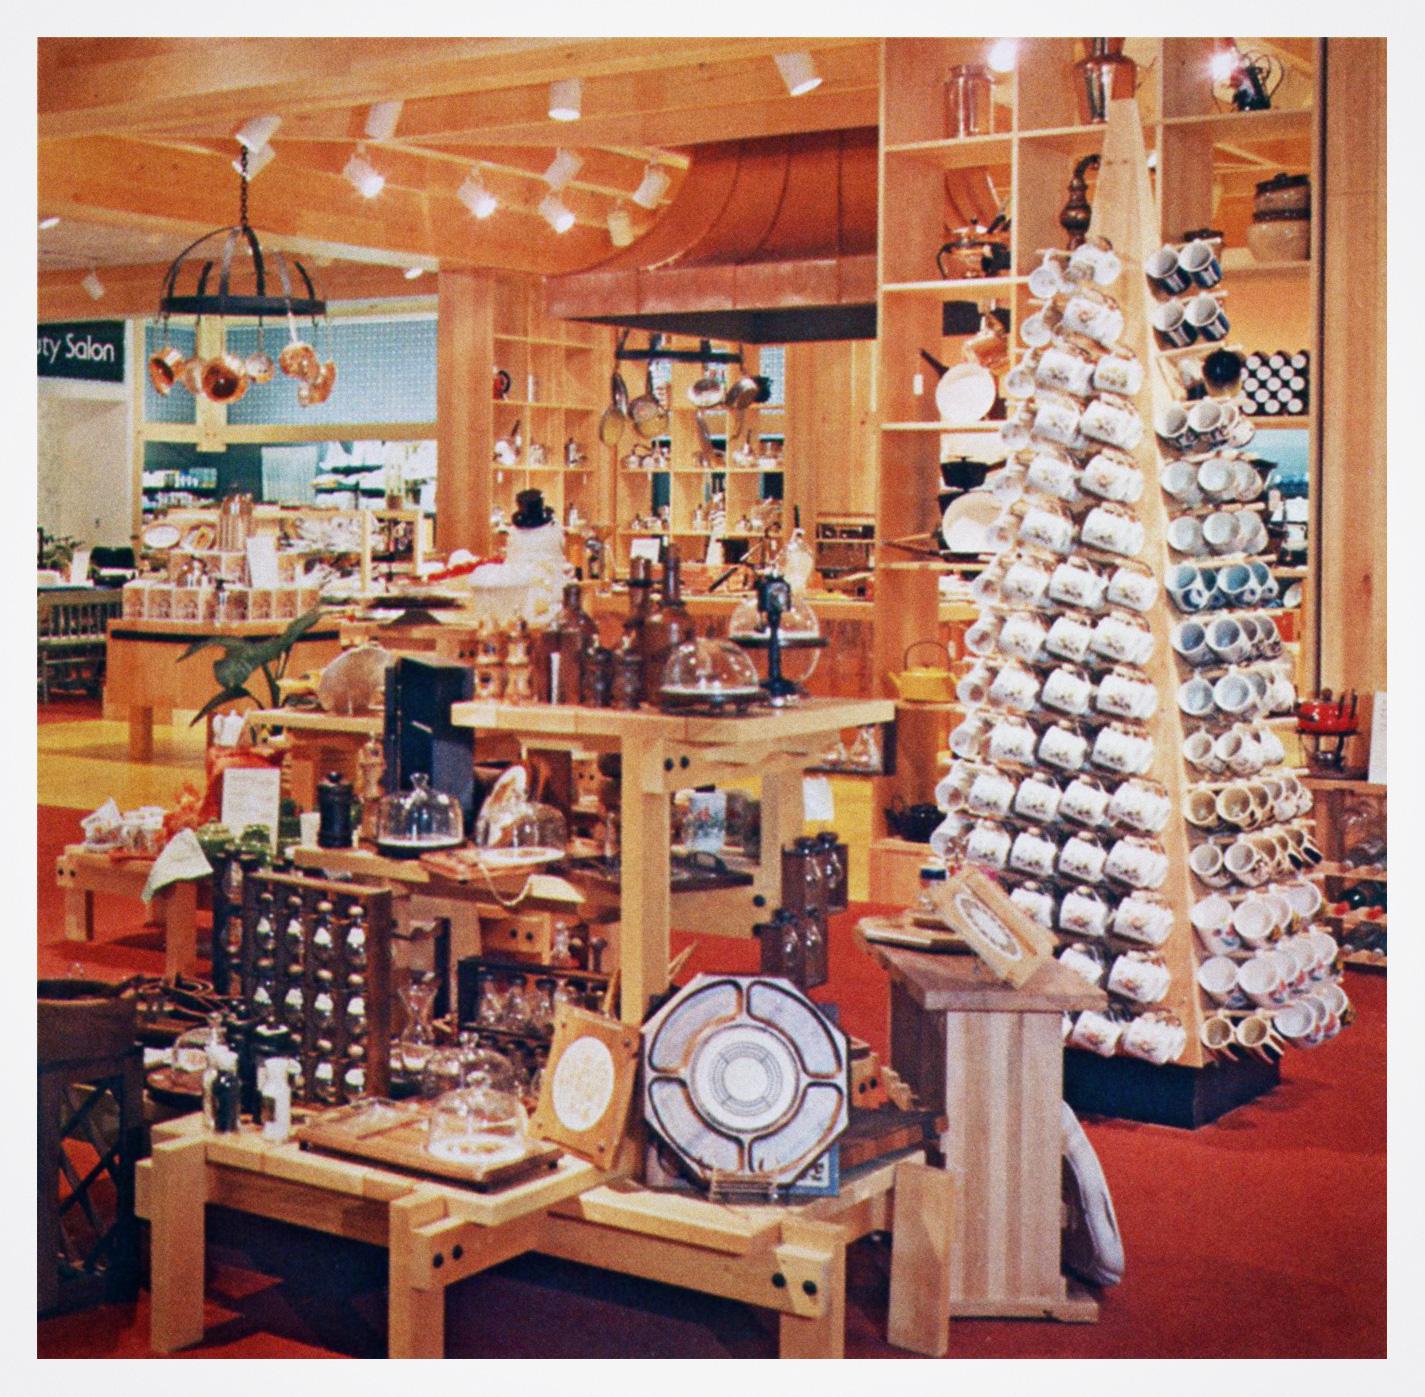 Joseph Horne Company store